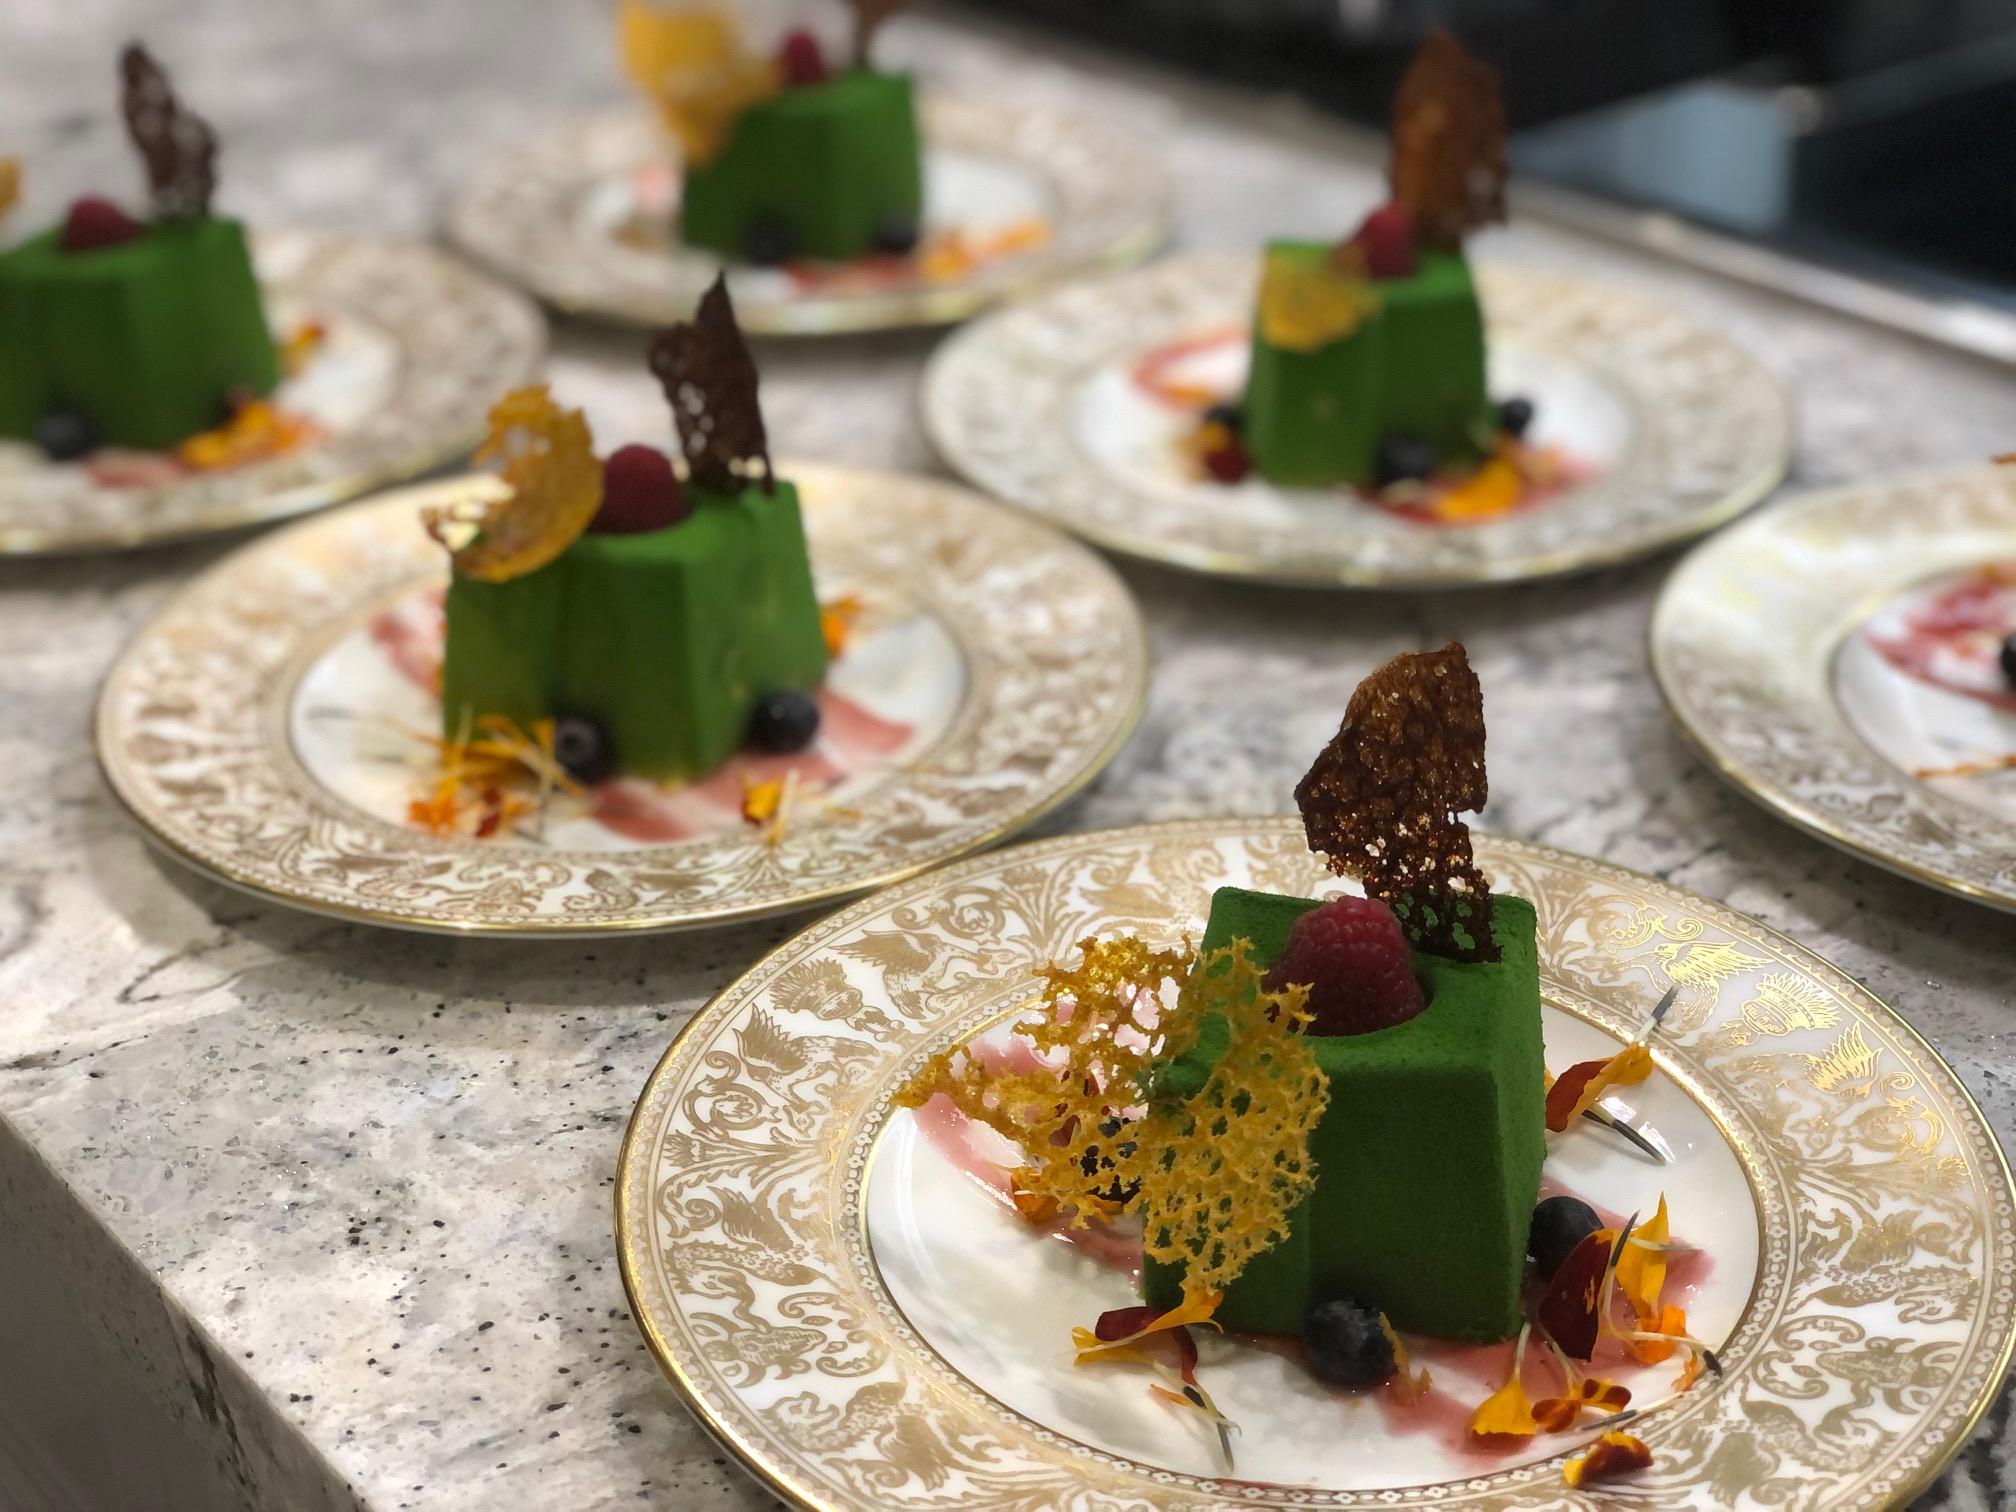 pistacchio-mousse-cakes-personal-chef-services